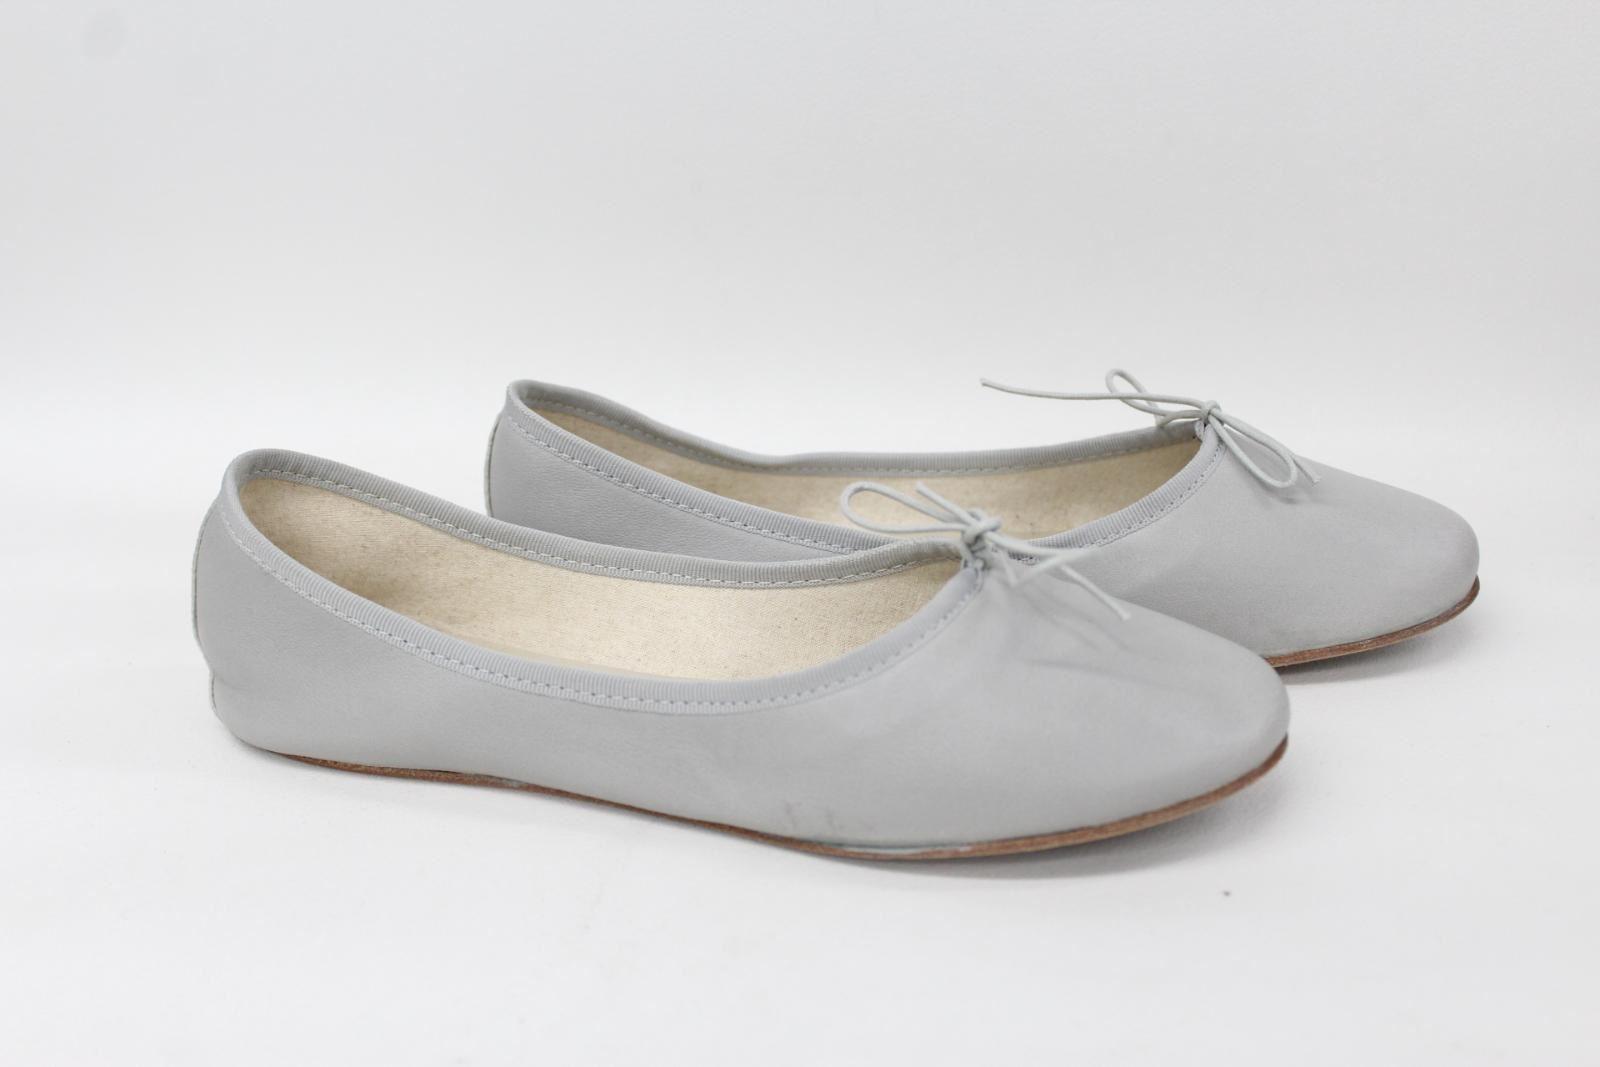 ANNIEL-Ladies-Grey-Leather-Flat-Round-Toe-Ballerina-Shoes-Pumps-UK6-5-EU41